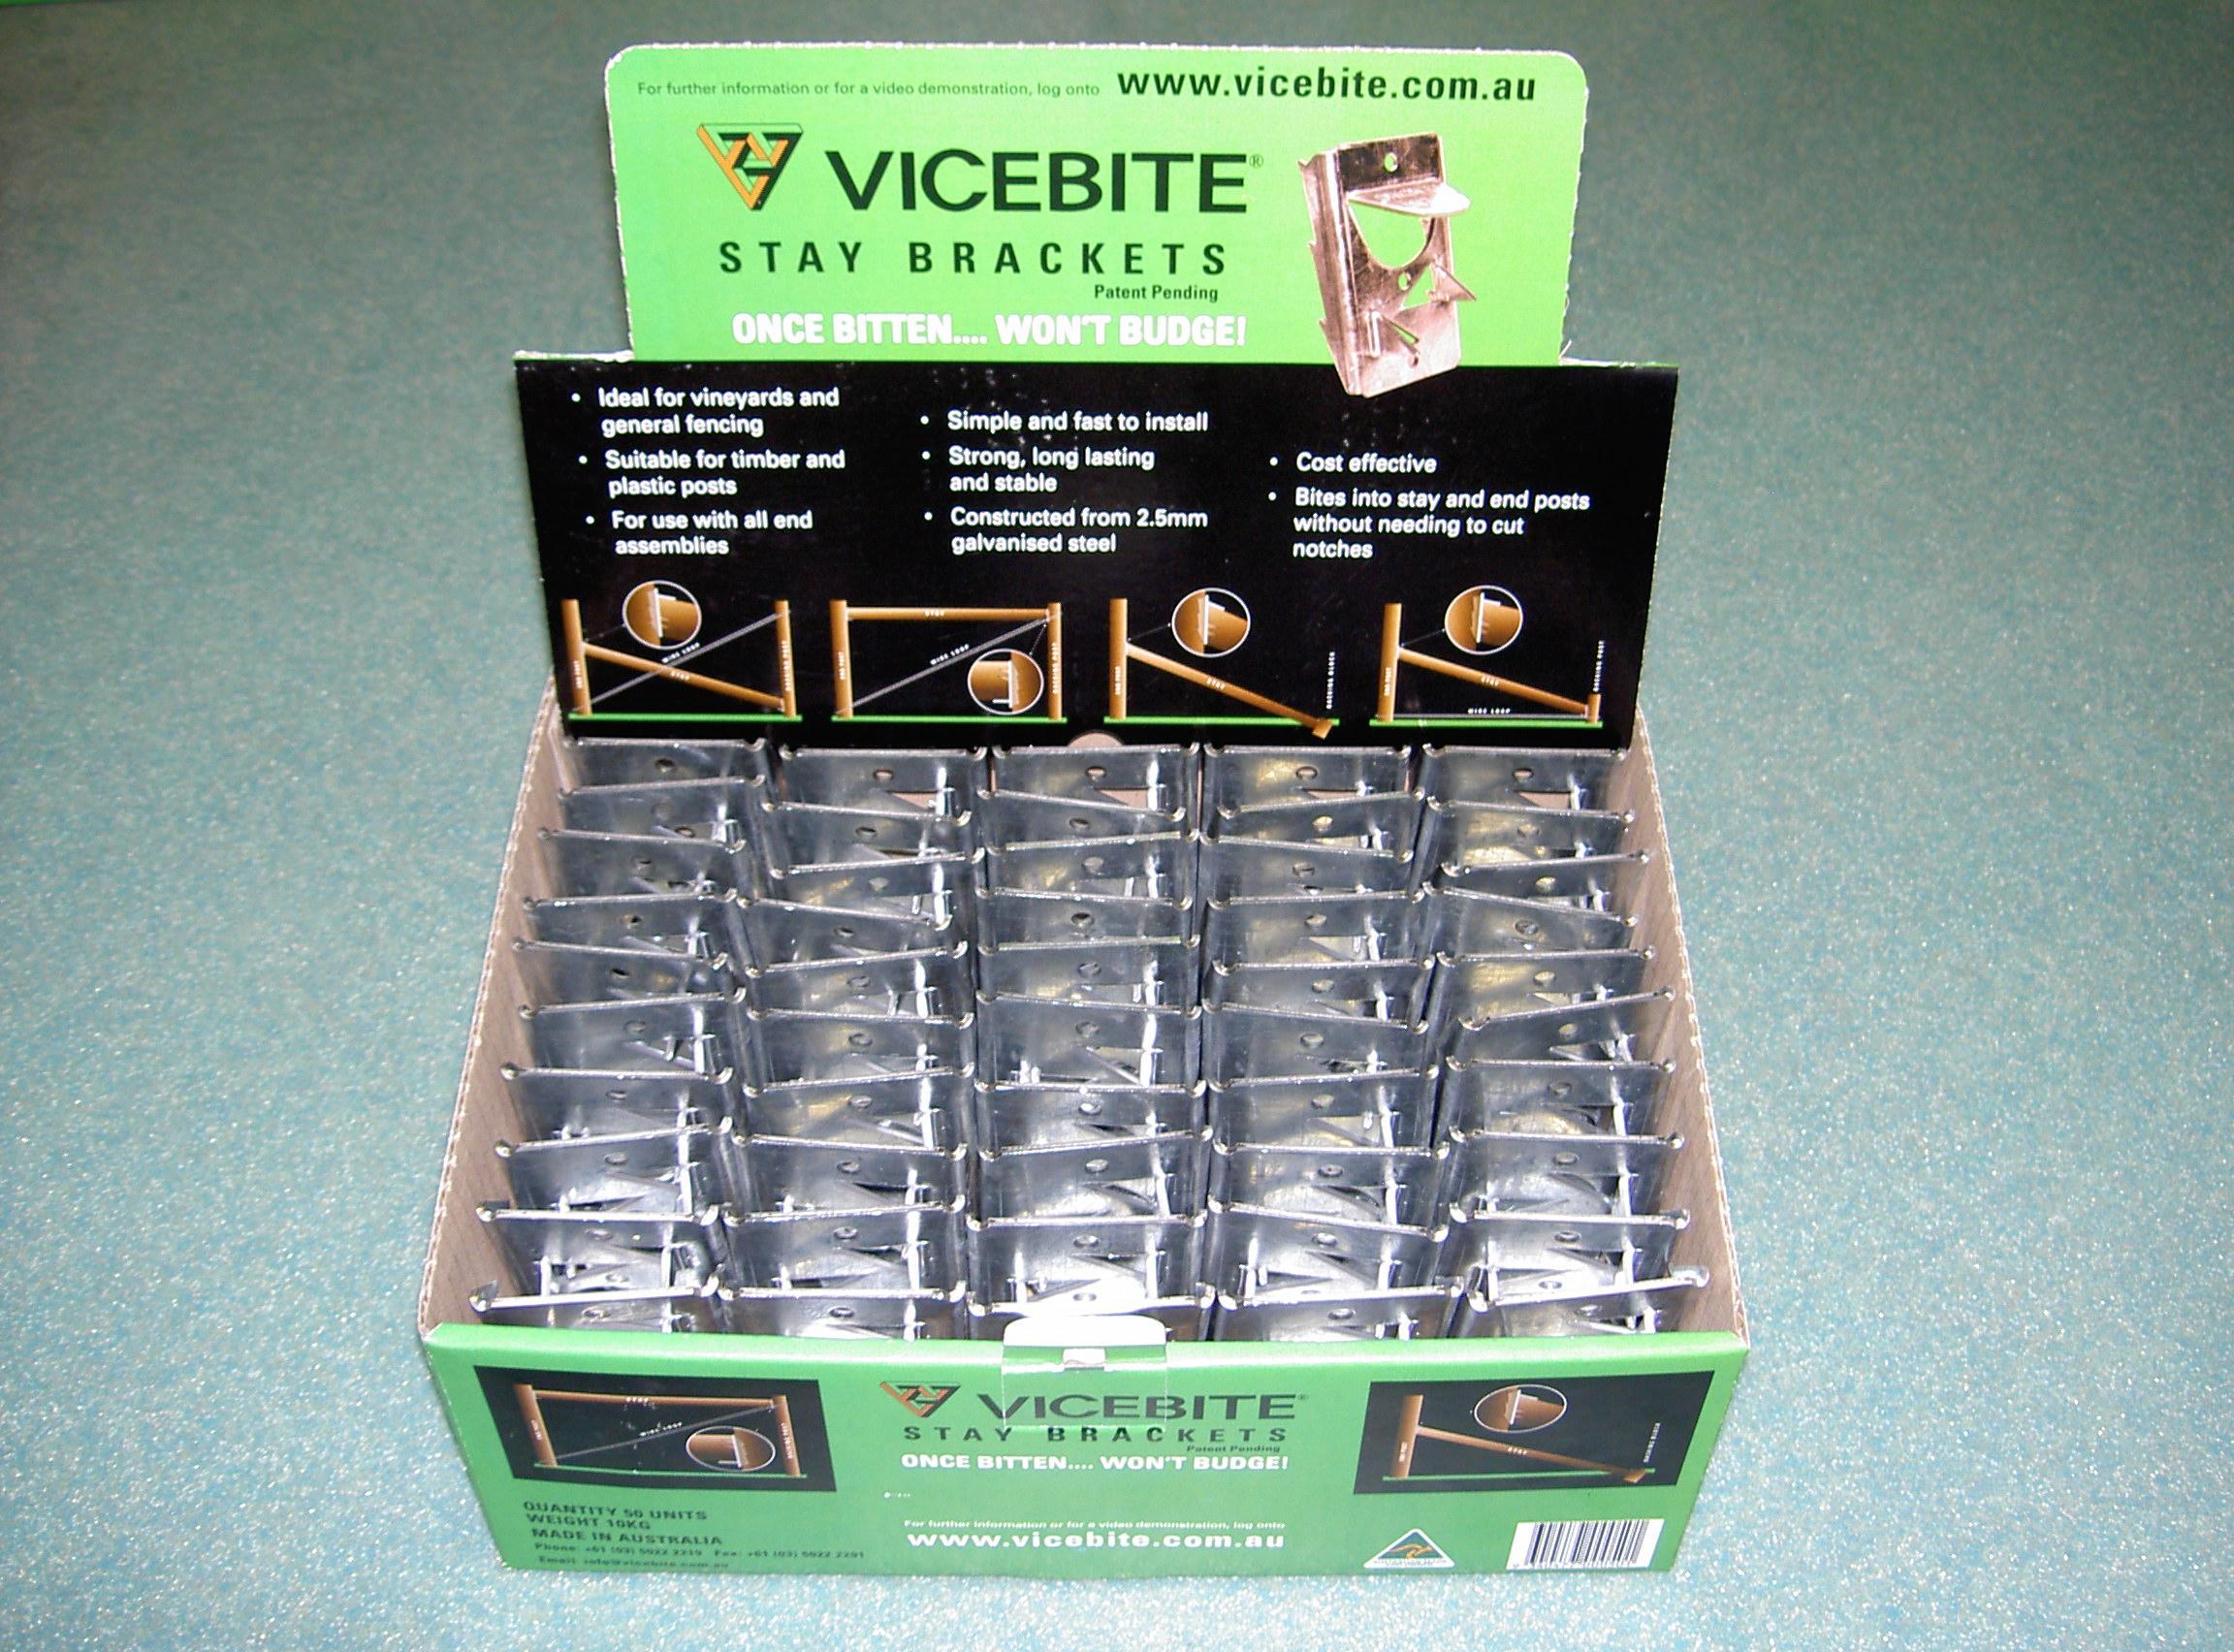 Vicebite display box